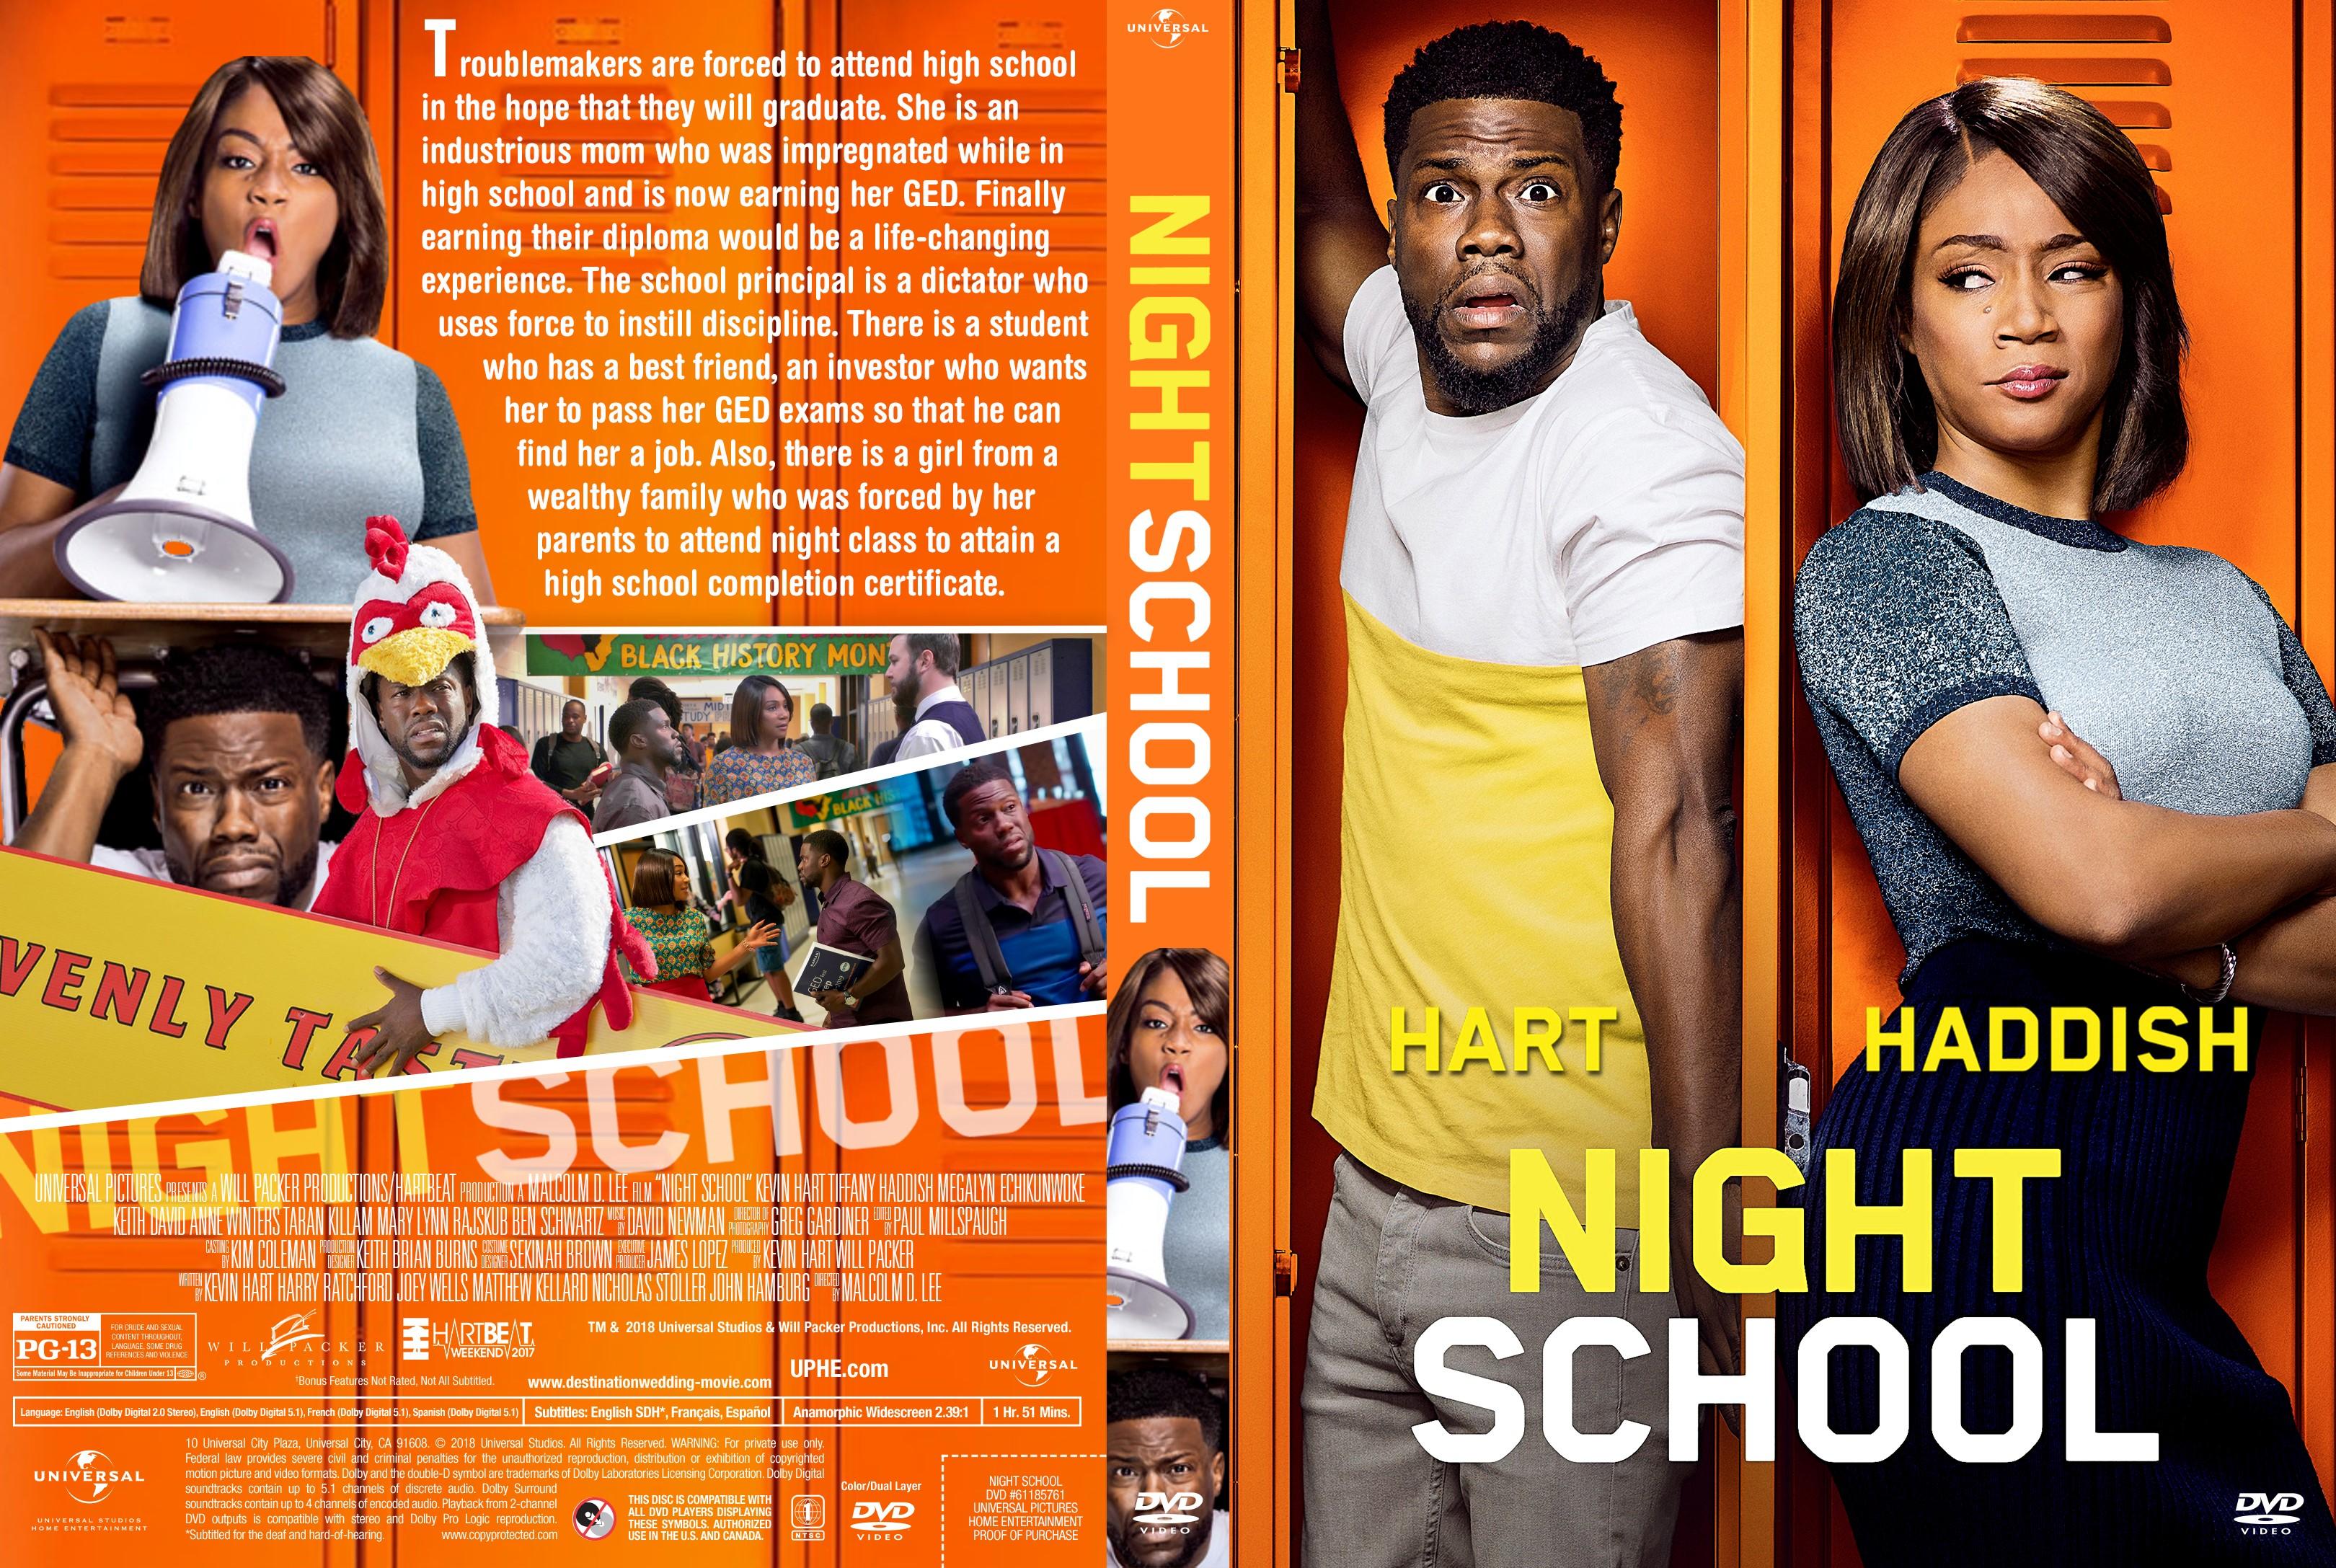 night school dvd cover cover addict dvd bluray covers